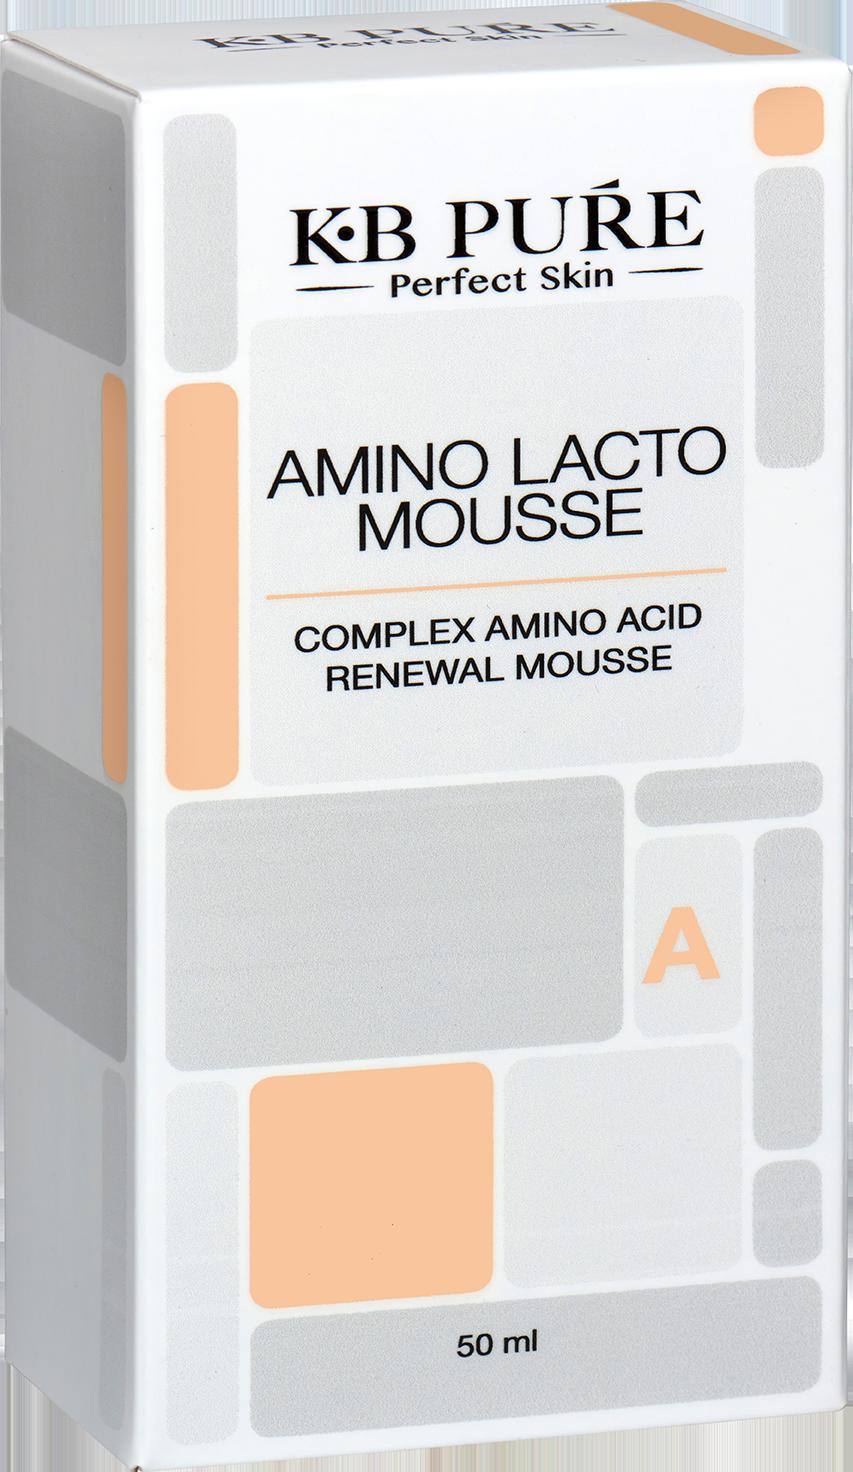 AMINO LACTO MUSSE R [] (s)